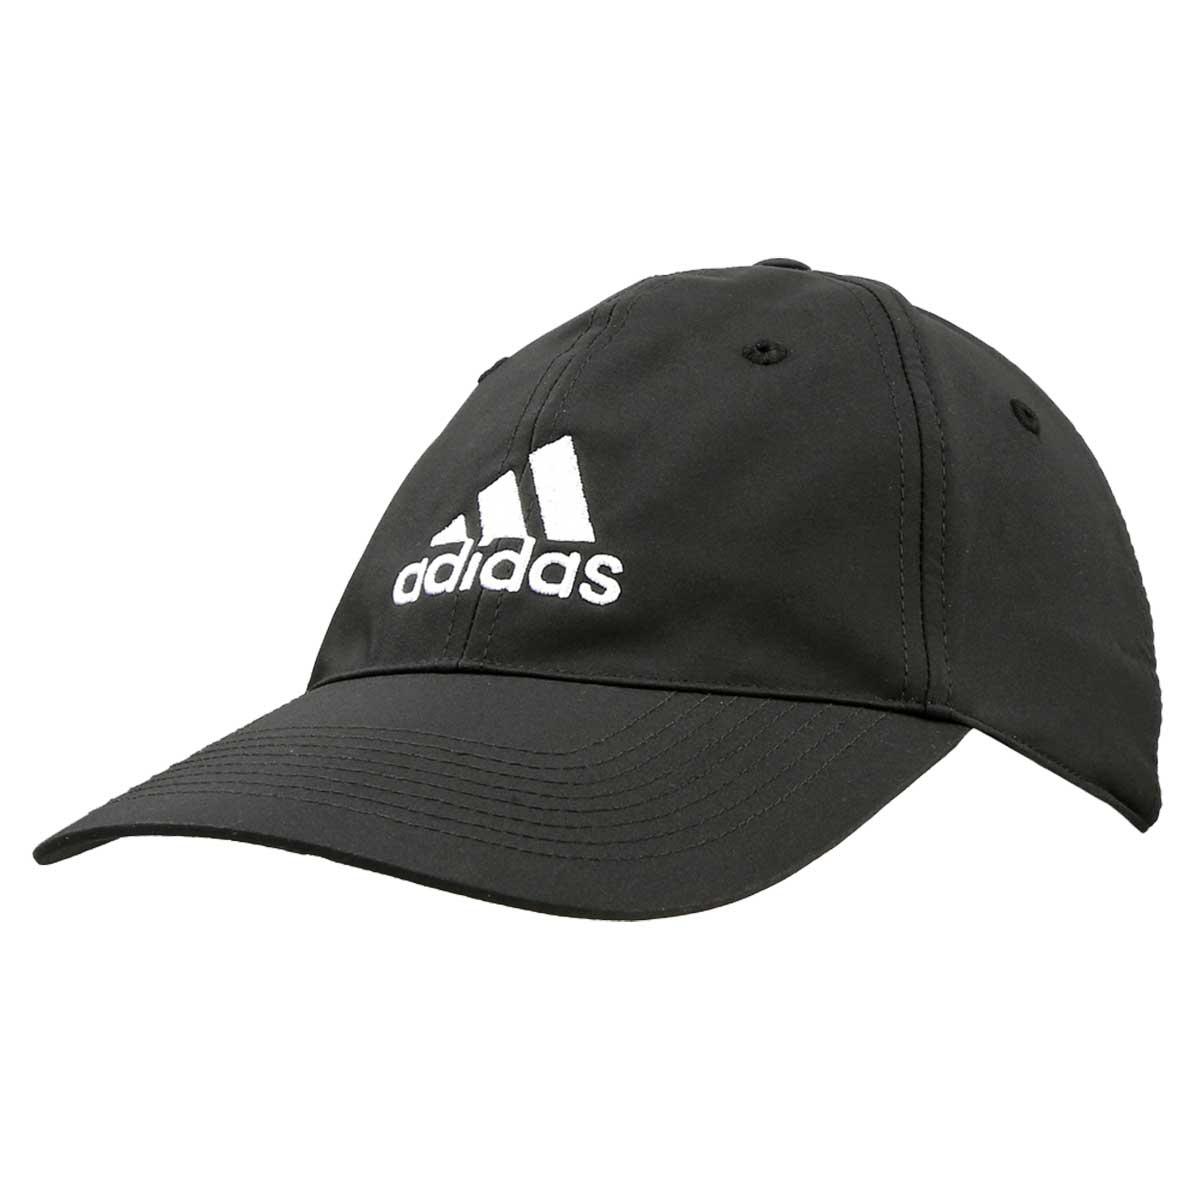 fb43dd9148 Buy Adidas Solid Black Unisex Cap Online at Lowest Price in India